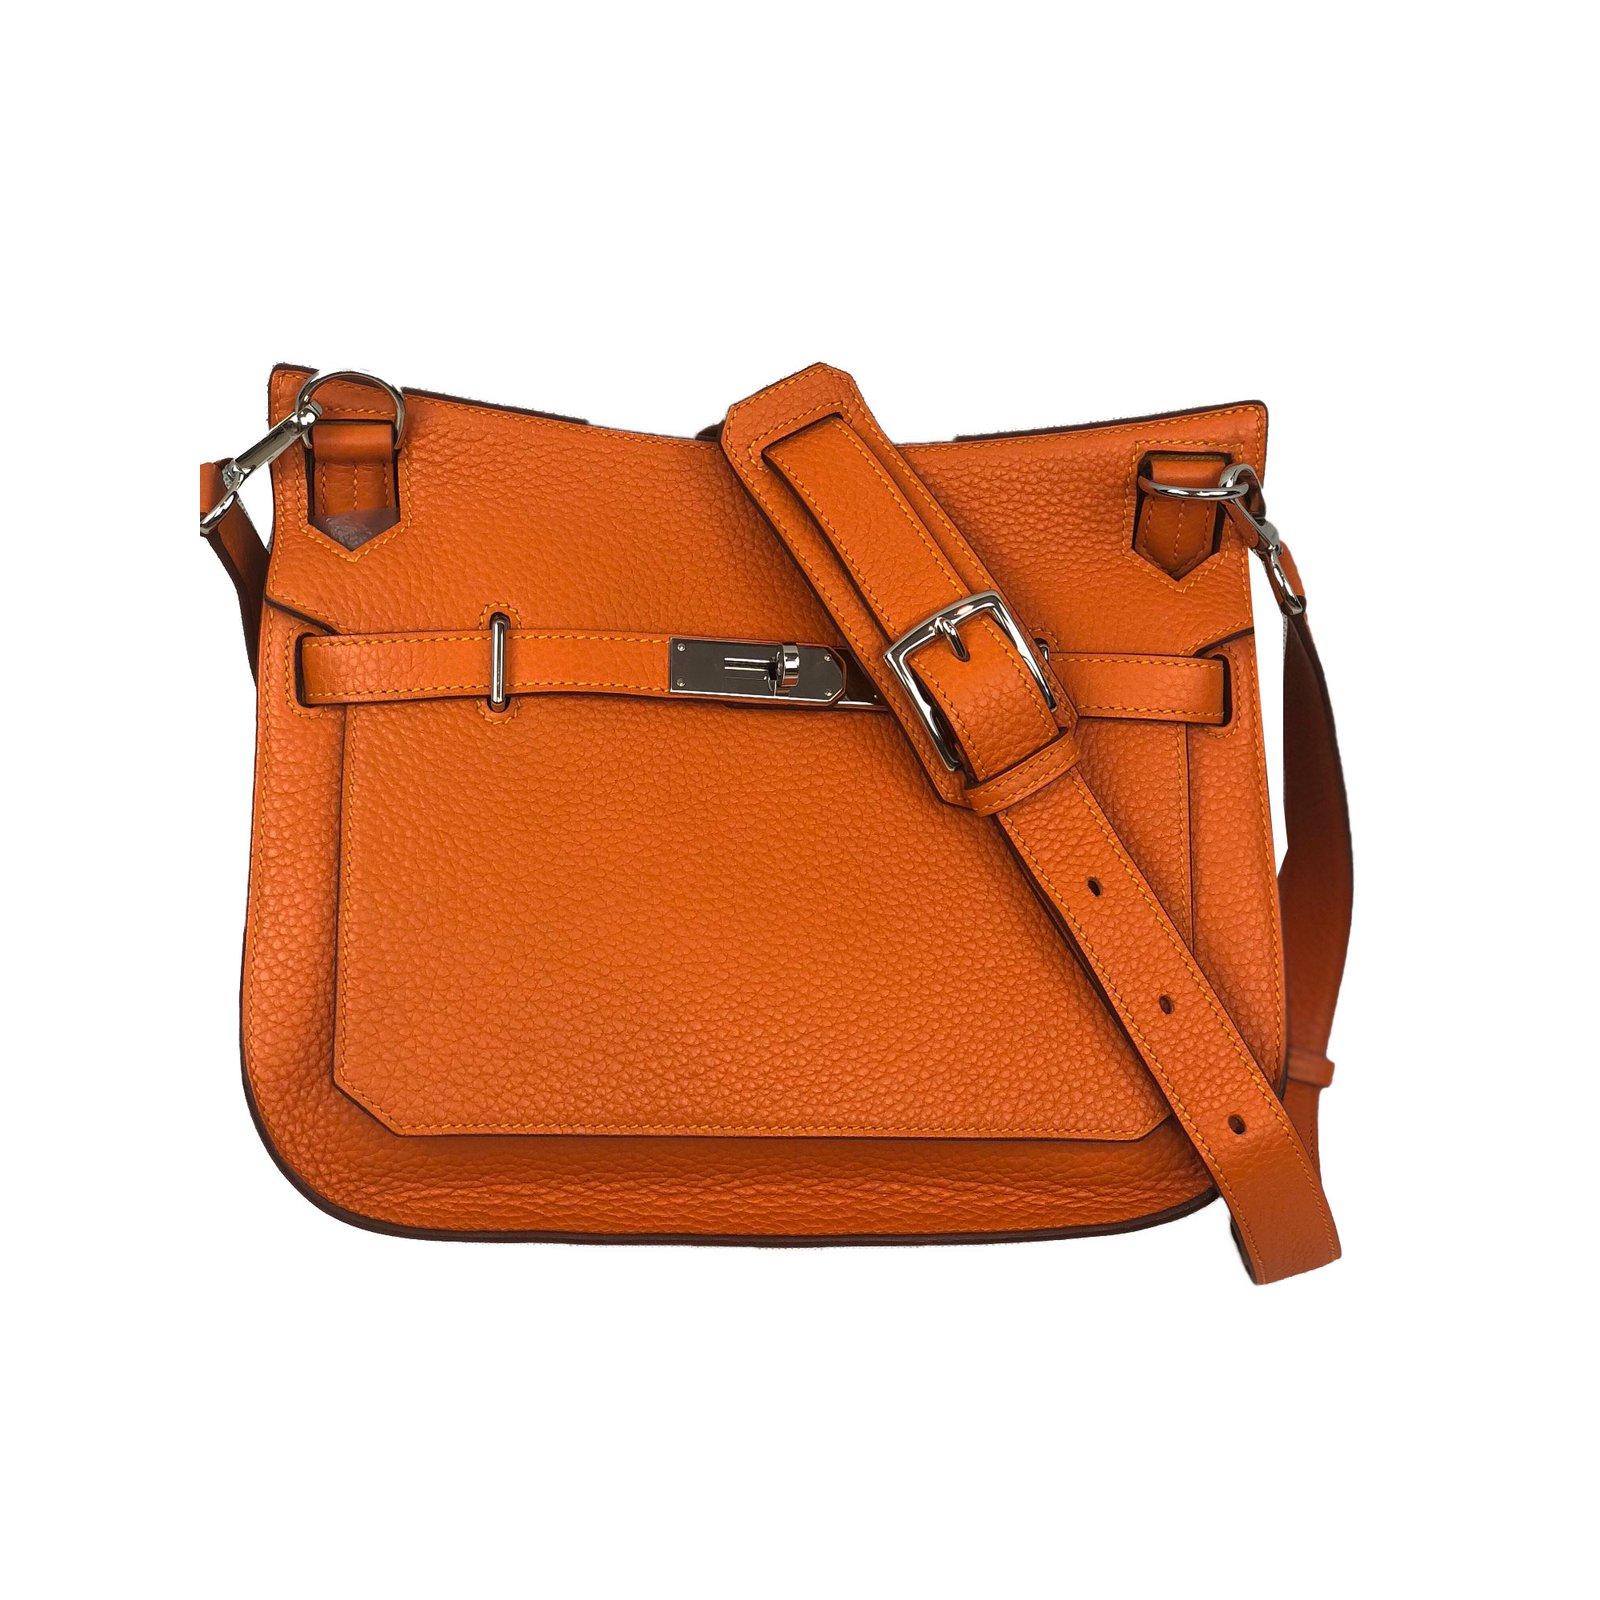 9dc5056e6230 ... black leather togo. hardware best price sacs à main hermès jypsiere  cuir orange ref.75512 9c130 5e609 ...